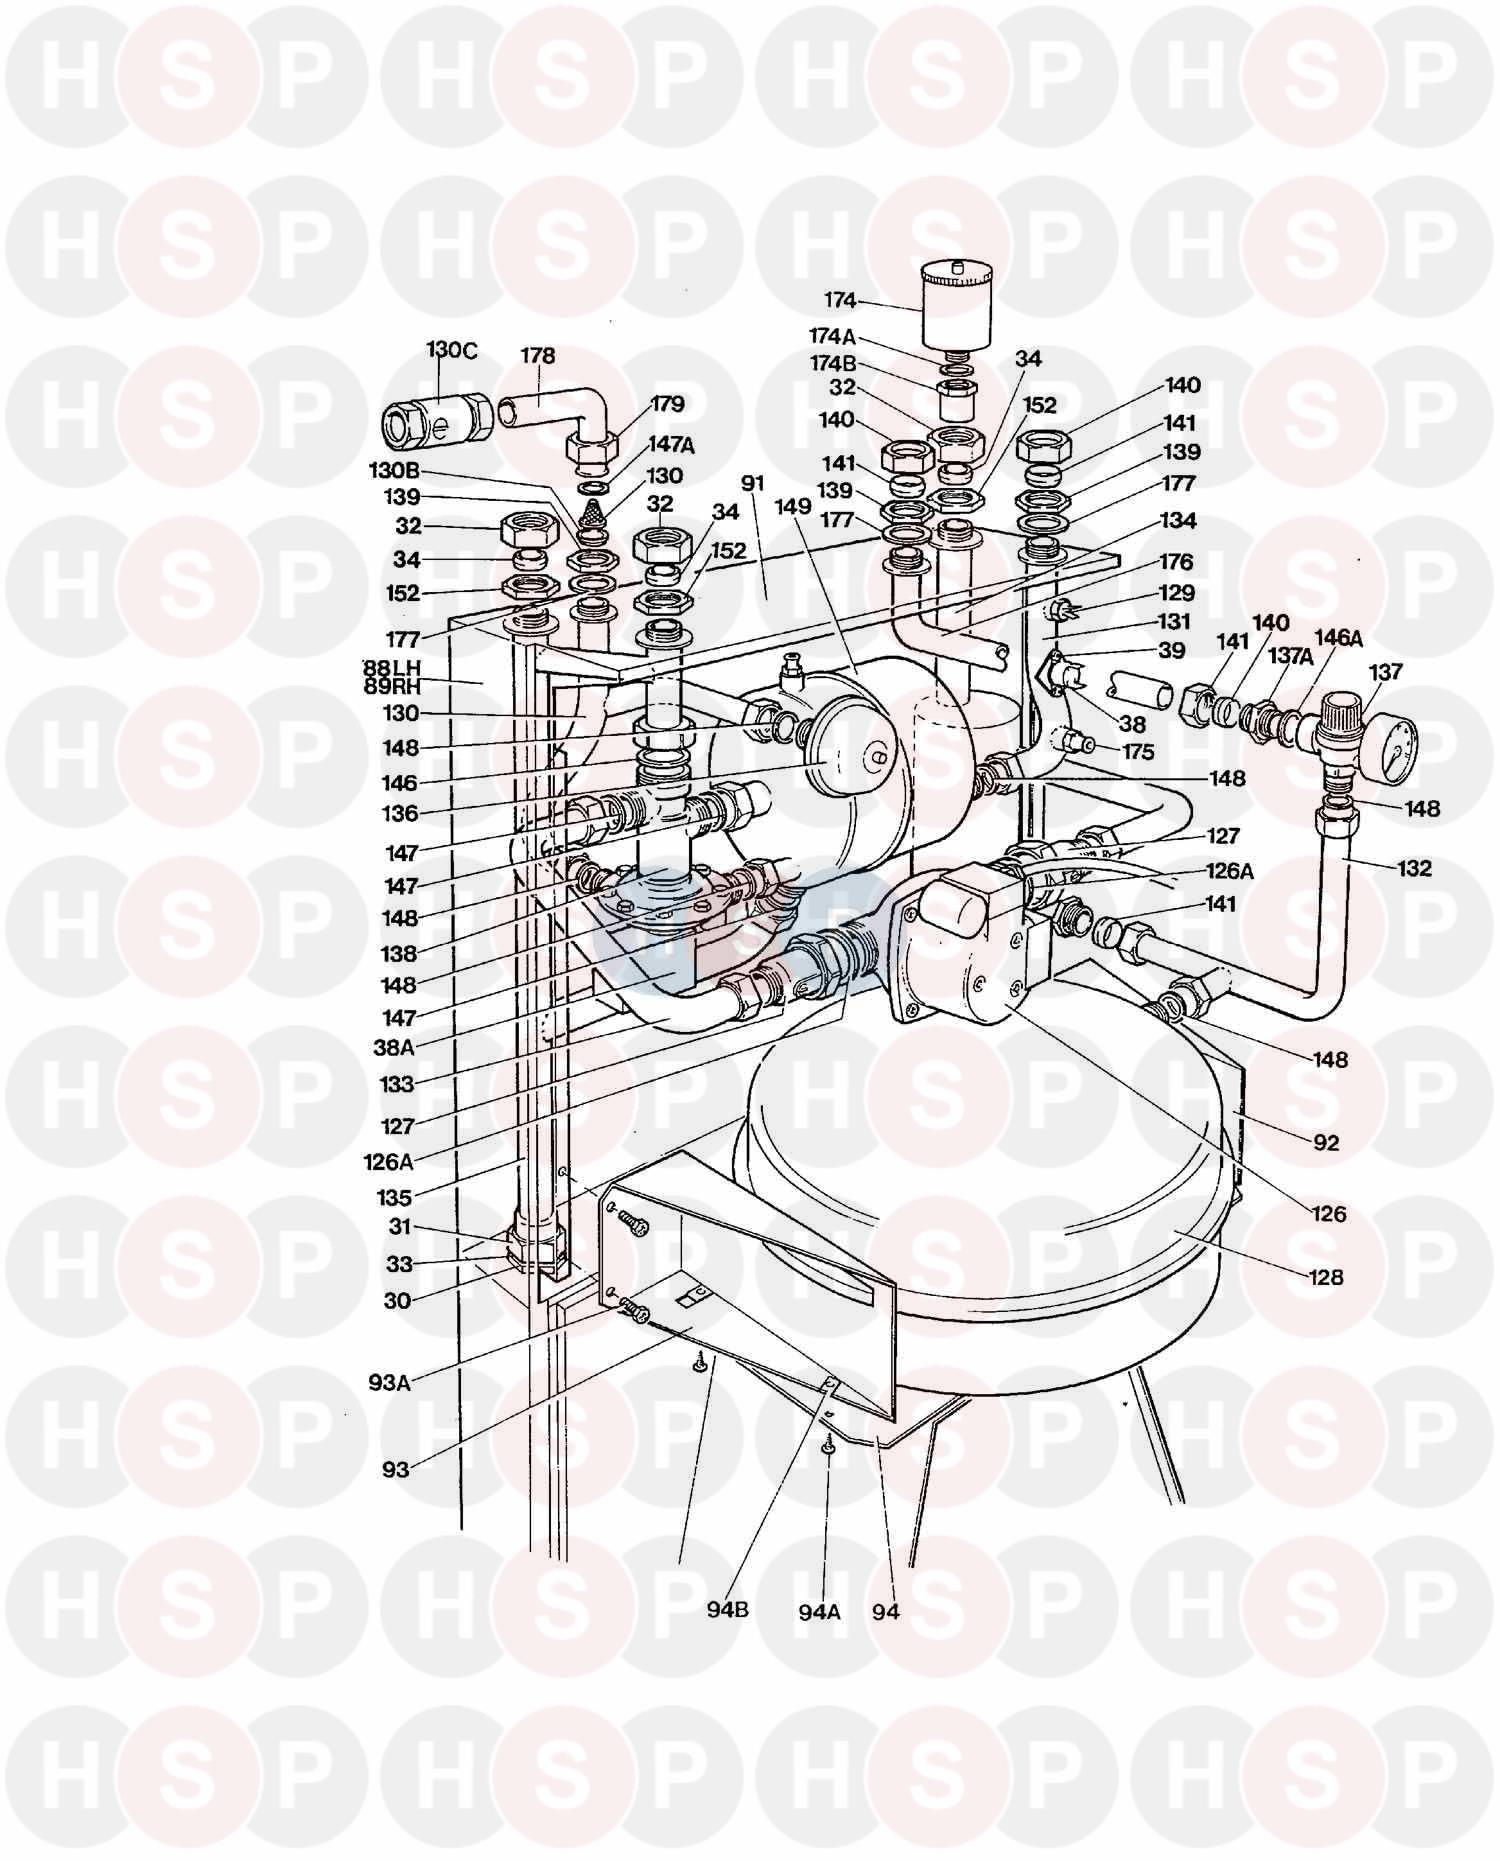 myson gemini 1988 sealed diagram heating spare parts. Black Bedroom Furniture Sets. Home Design Ideas